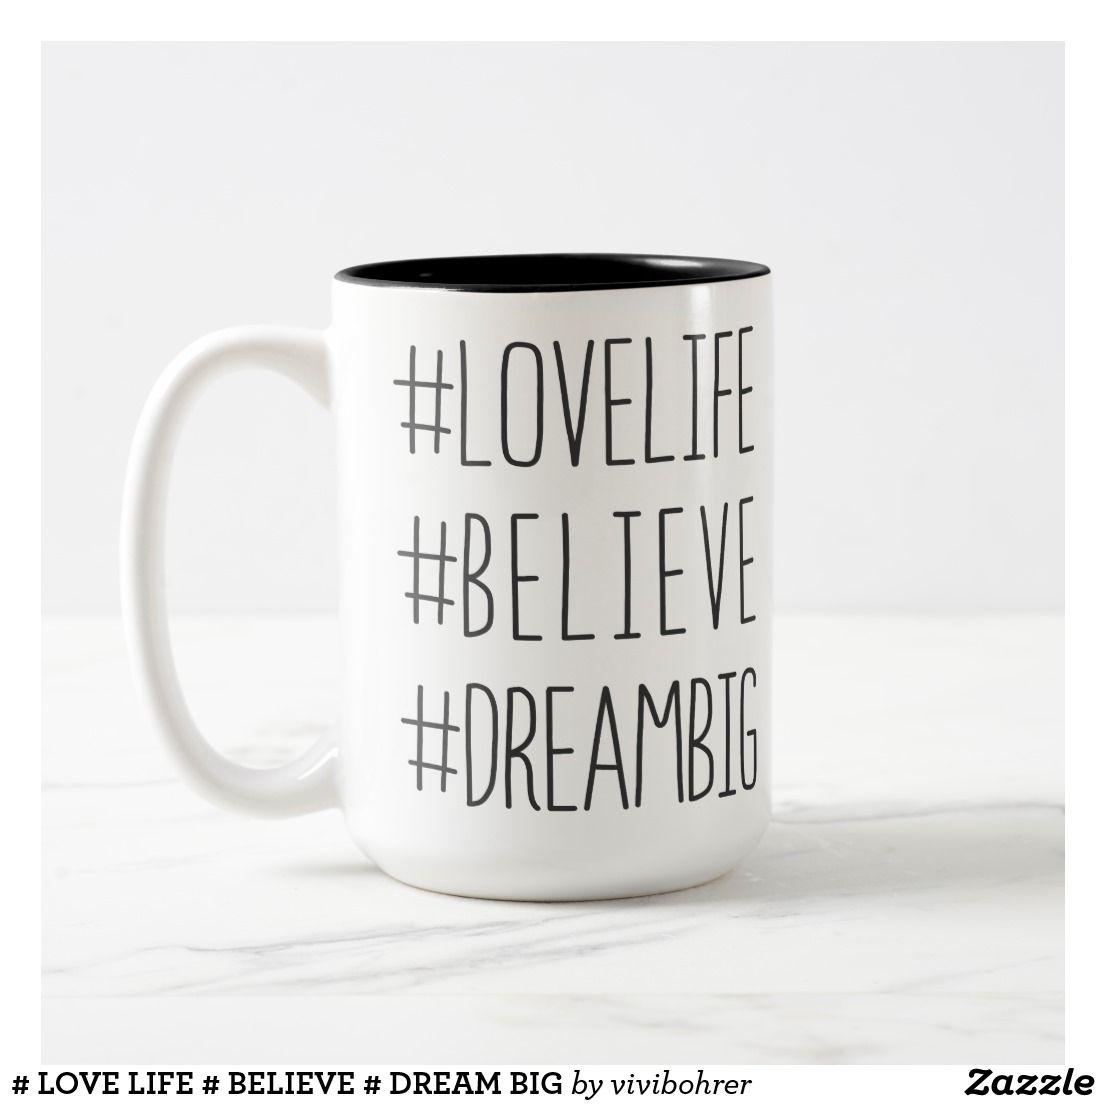 Love Life Believe Dream Big Two Tone Coffee Mug Zazzle Com In 2020 Dream Big Love Life Mugs